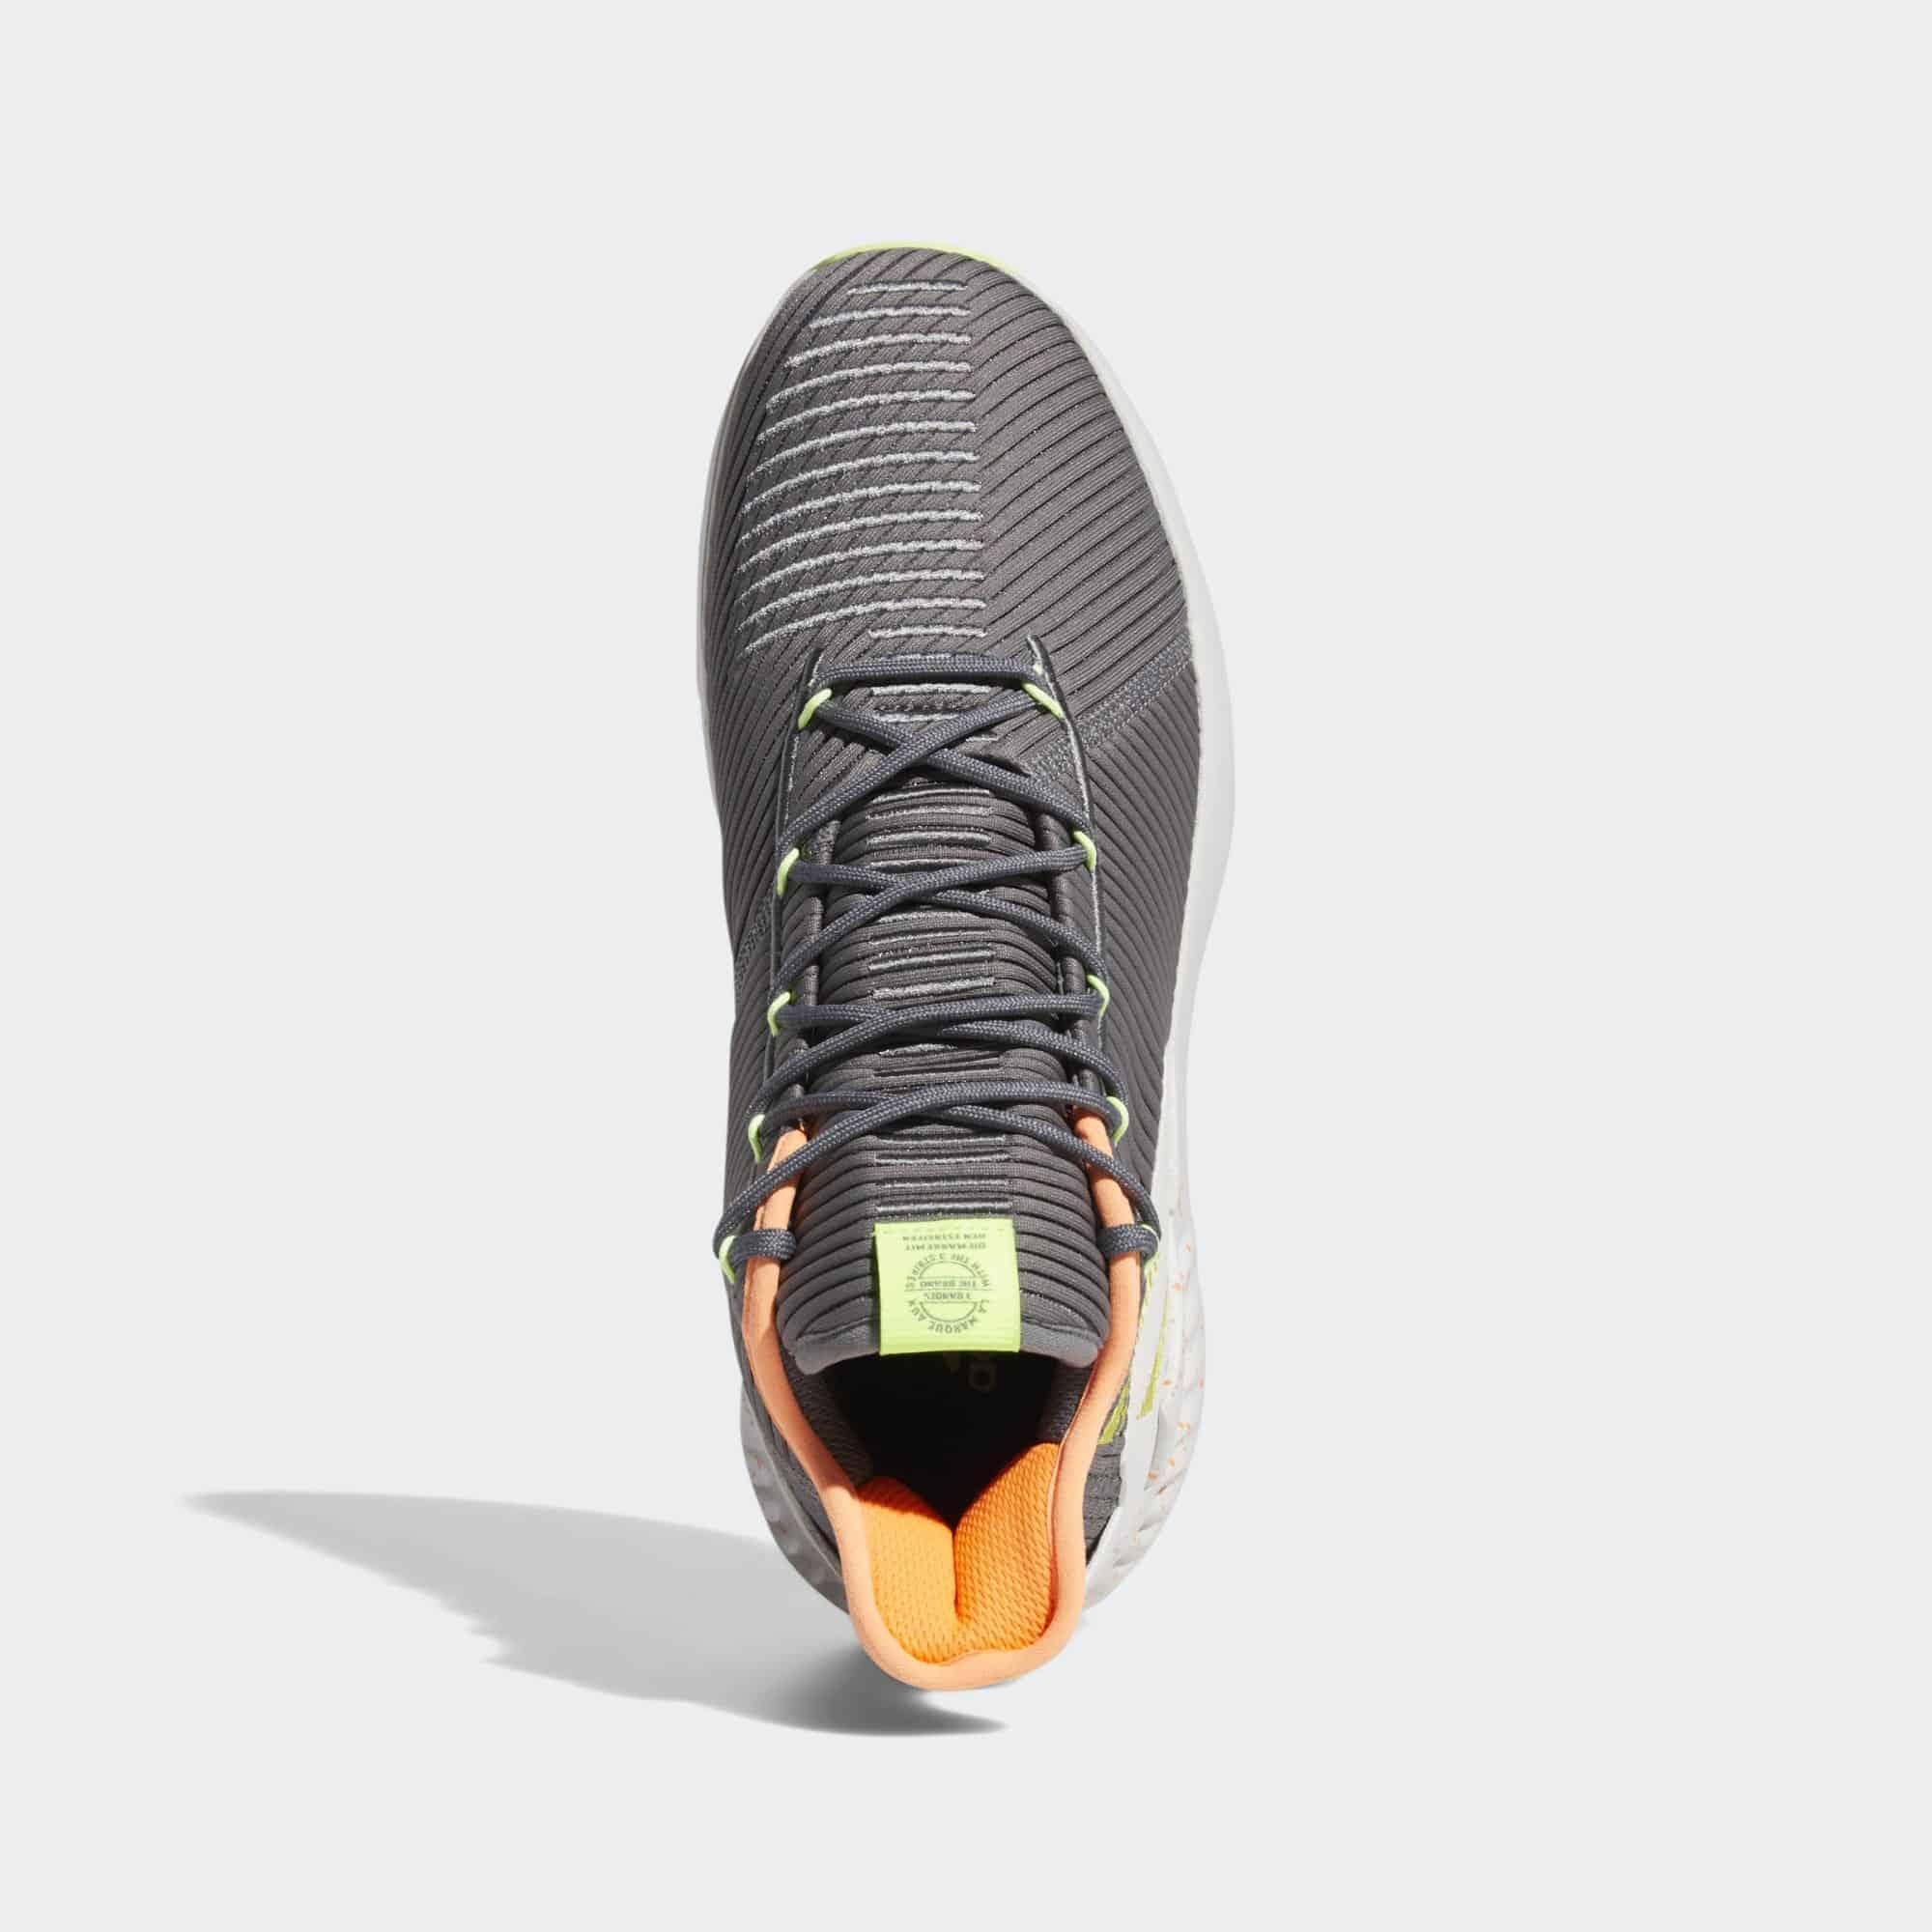 Adidas D Rose 9 Review: Top